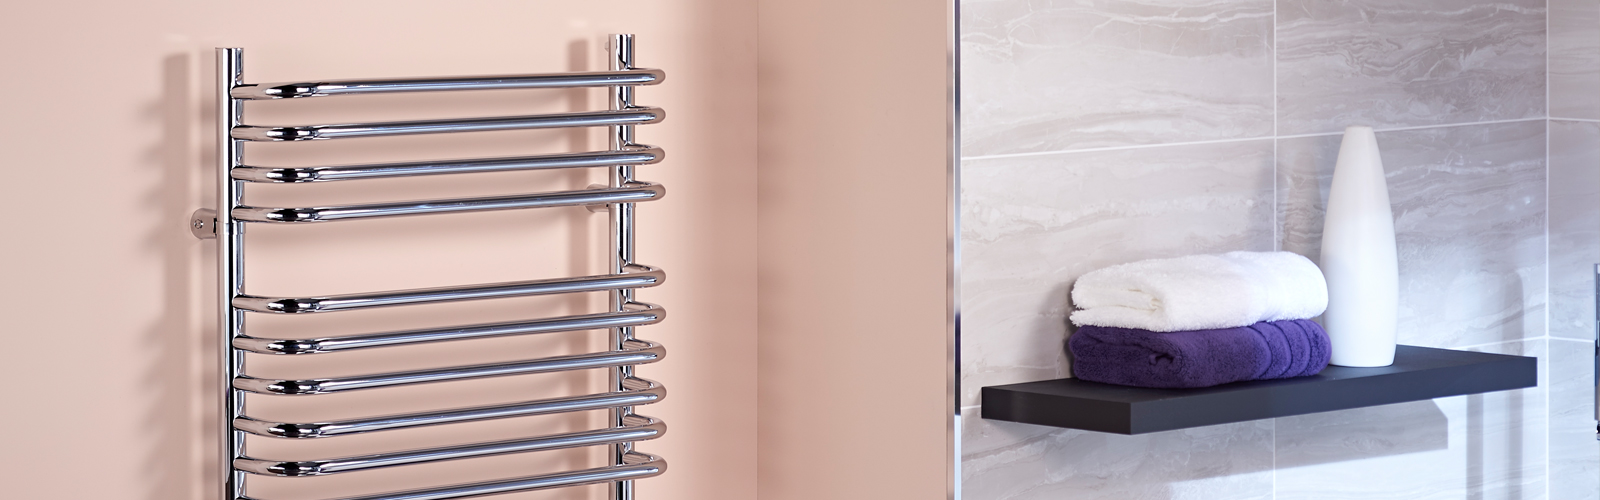 Towel rail header image